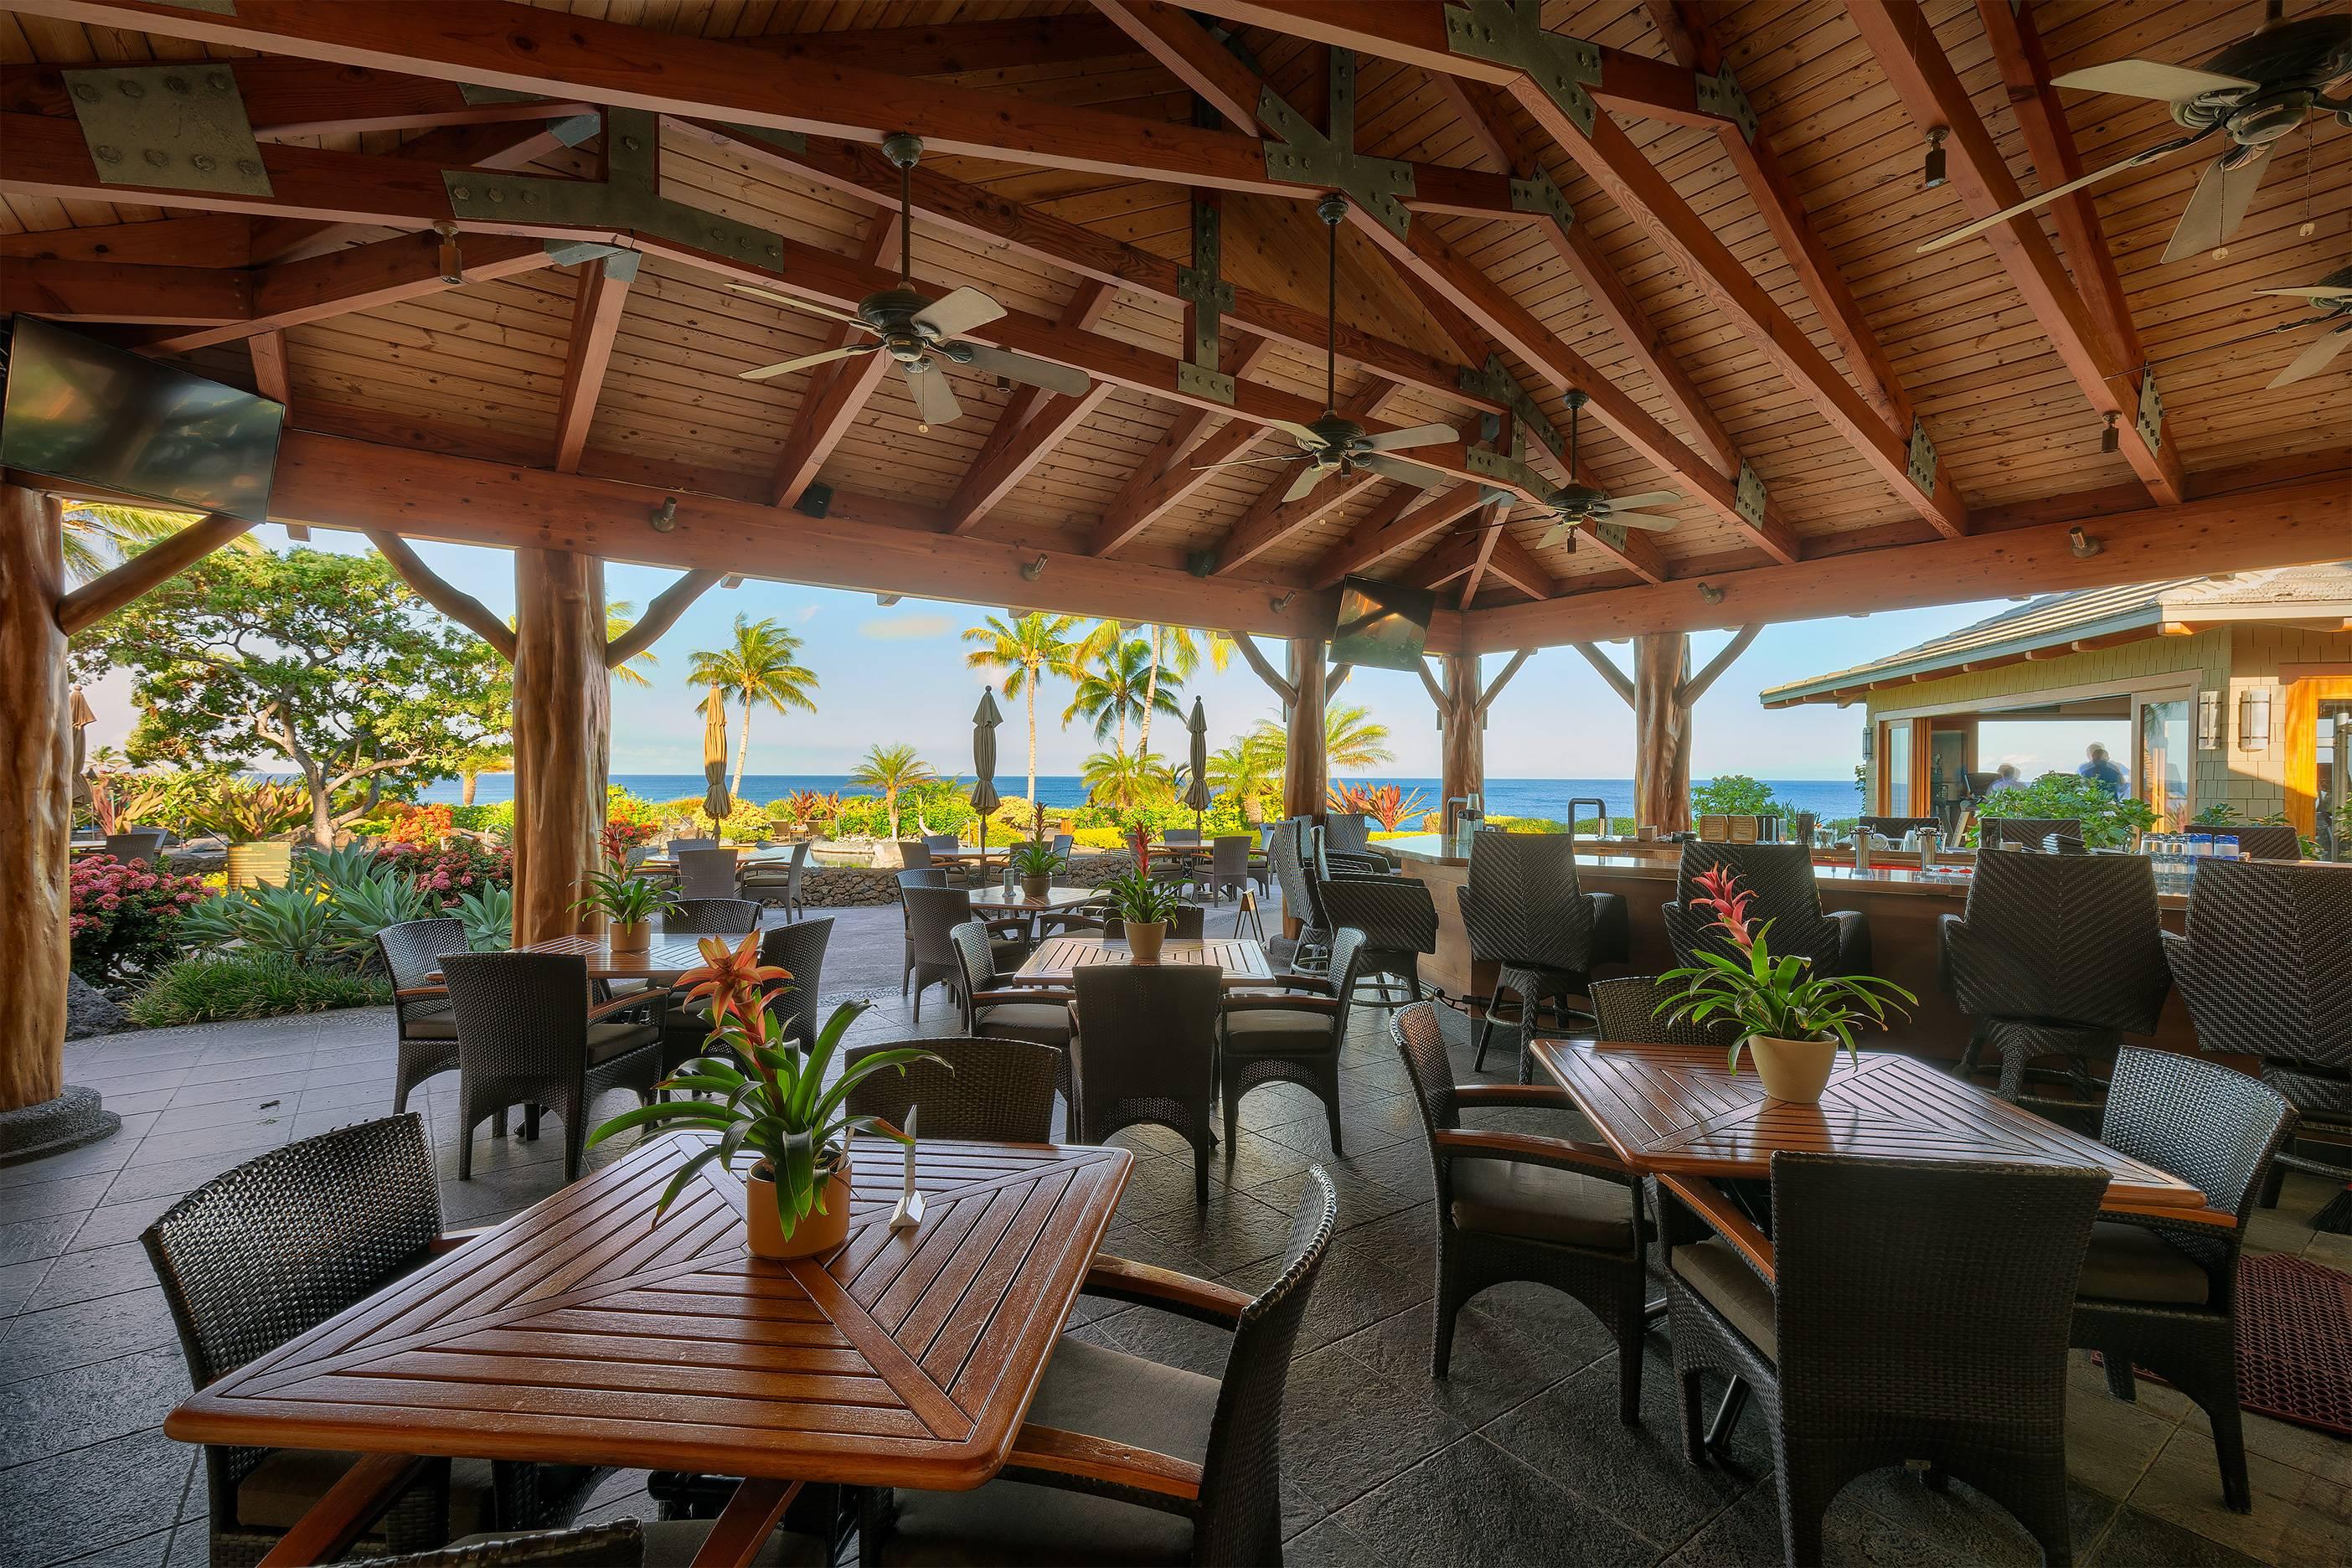 Halii Kai Restaurant at Waikoloa Beach Resort